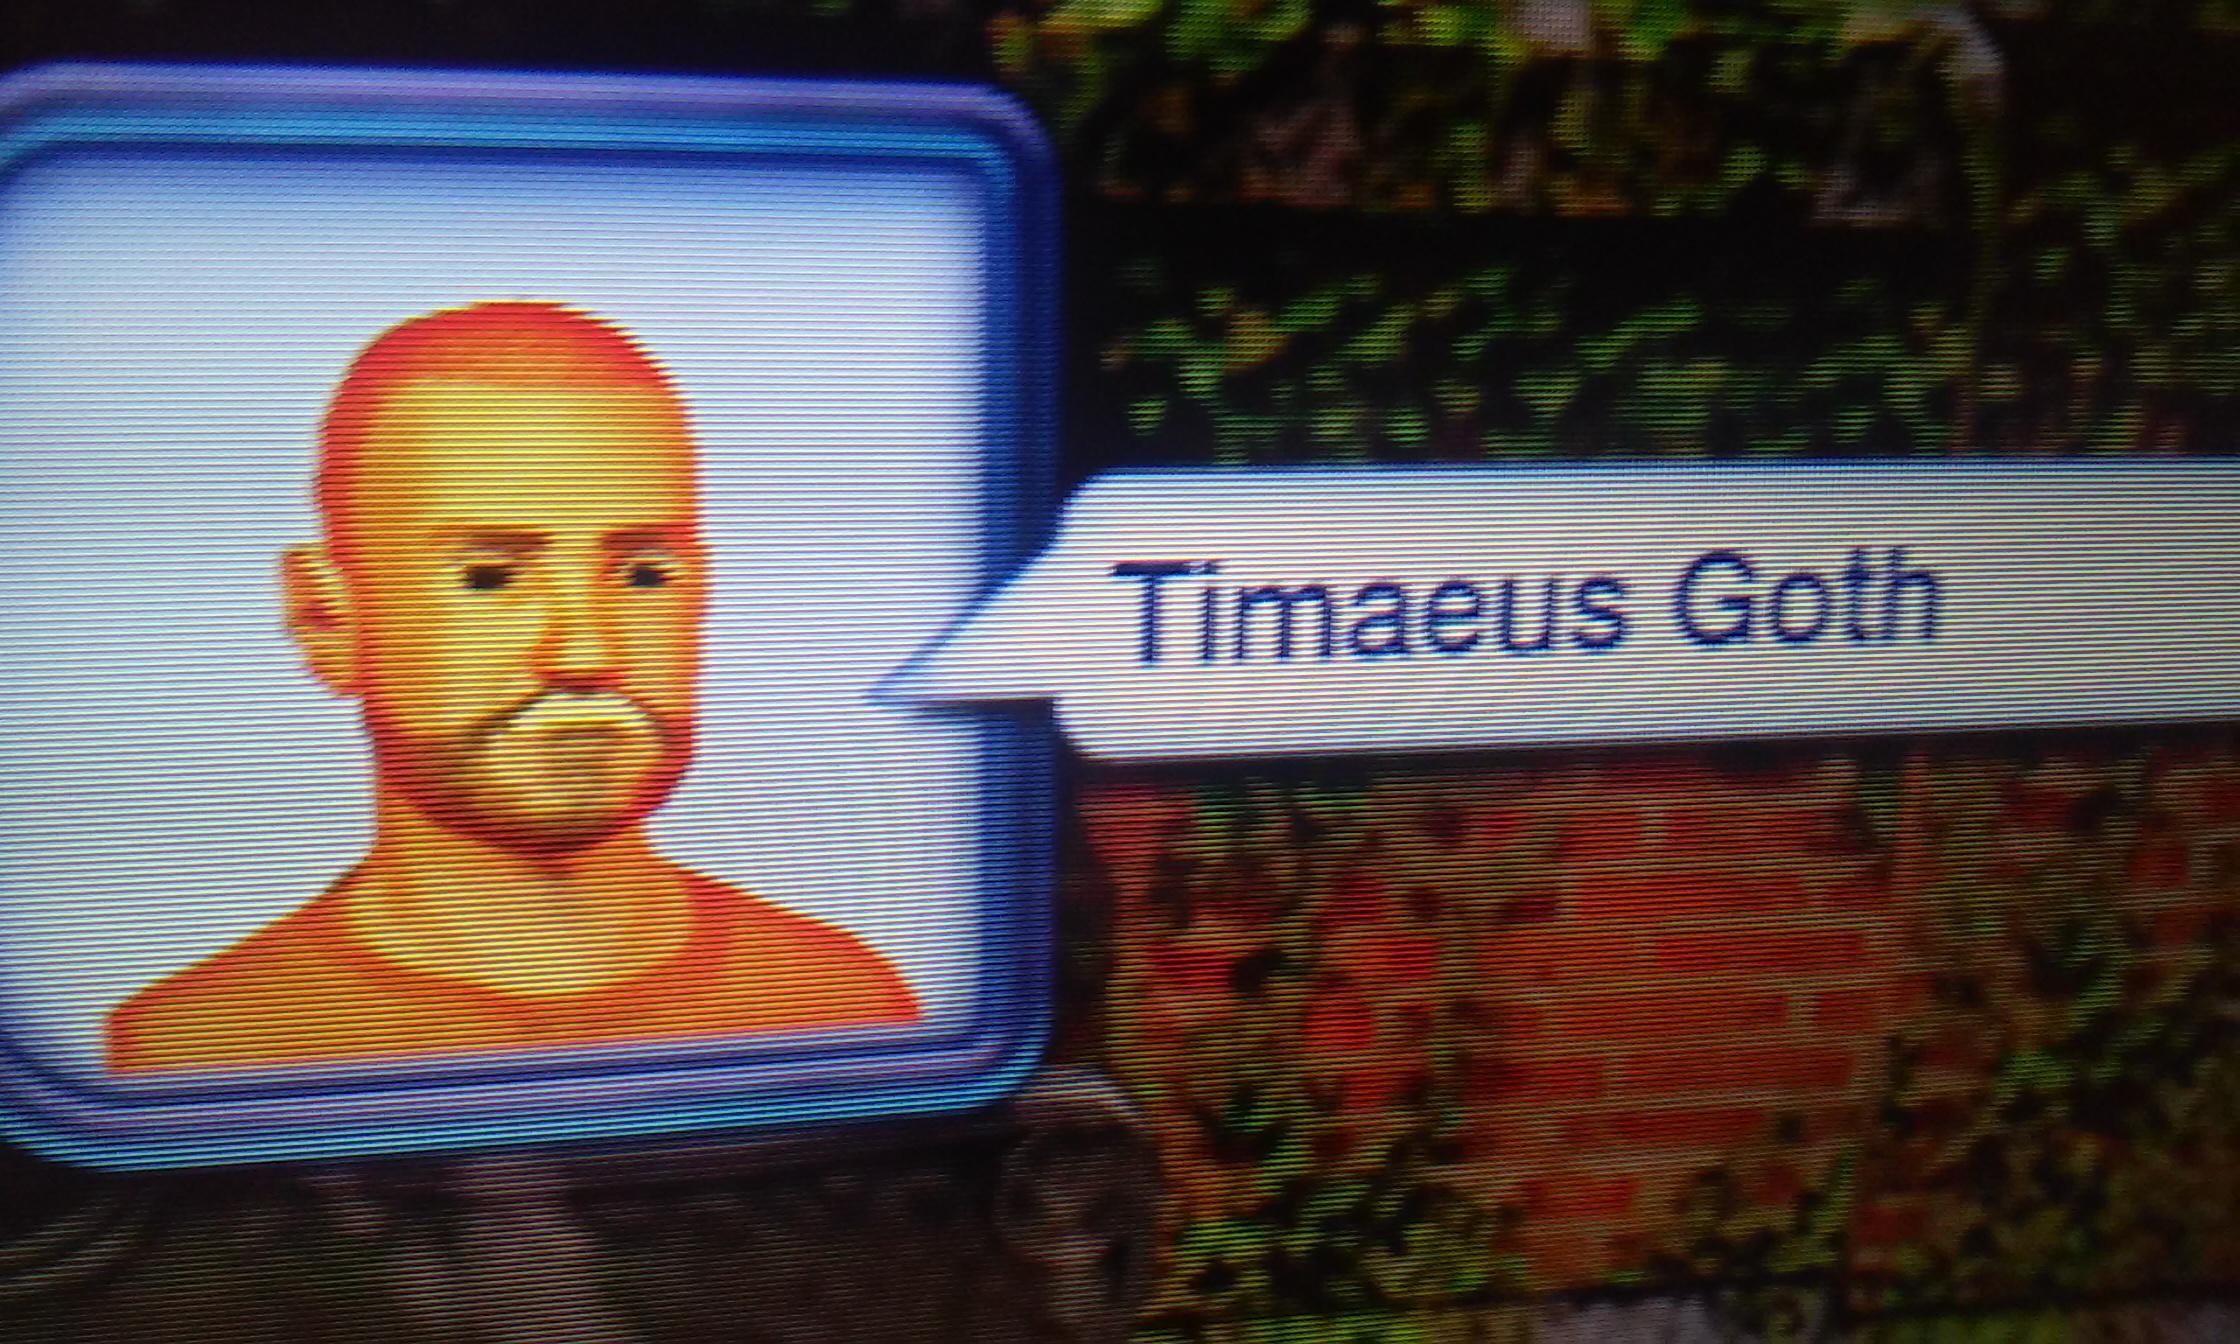 Timaeus Goth